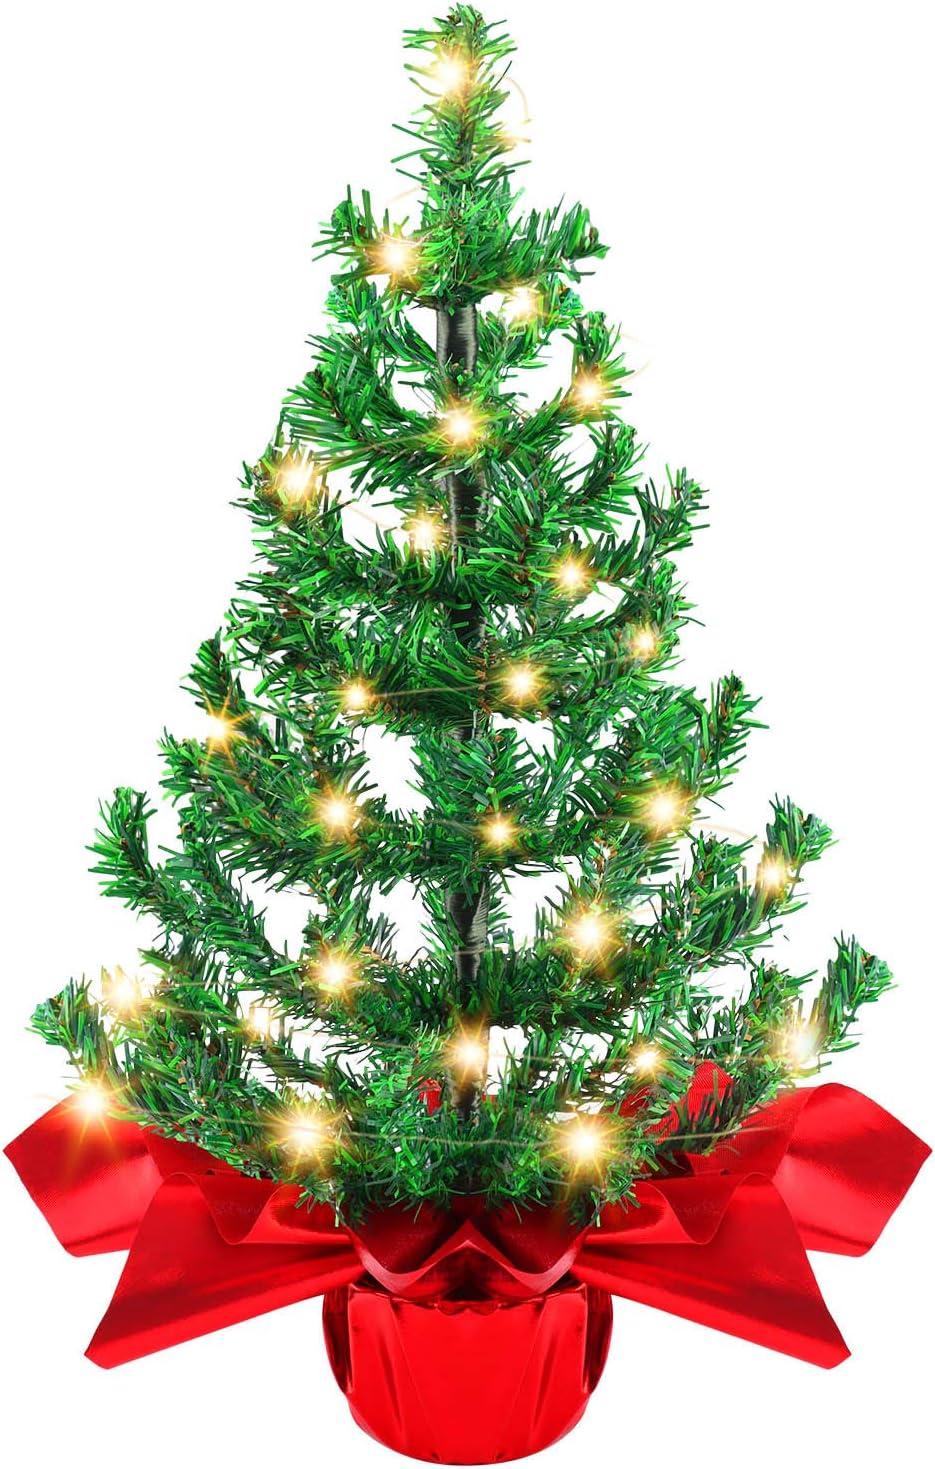 Becoyou Petit Sapin de Noel 60cm Mini Sapin de Noel Petit Sapin de Noel Artificiel Sapin de Noel Artificiel Petit Mini Sapin Decoration Noel Table